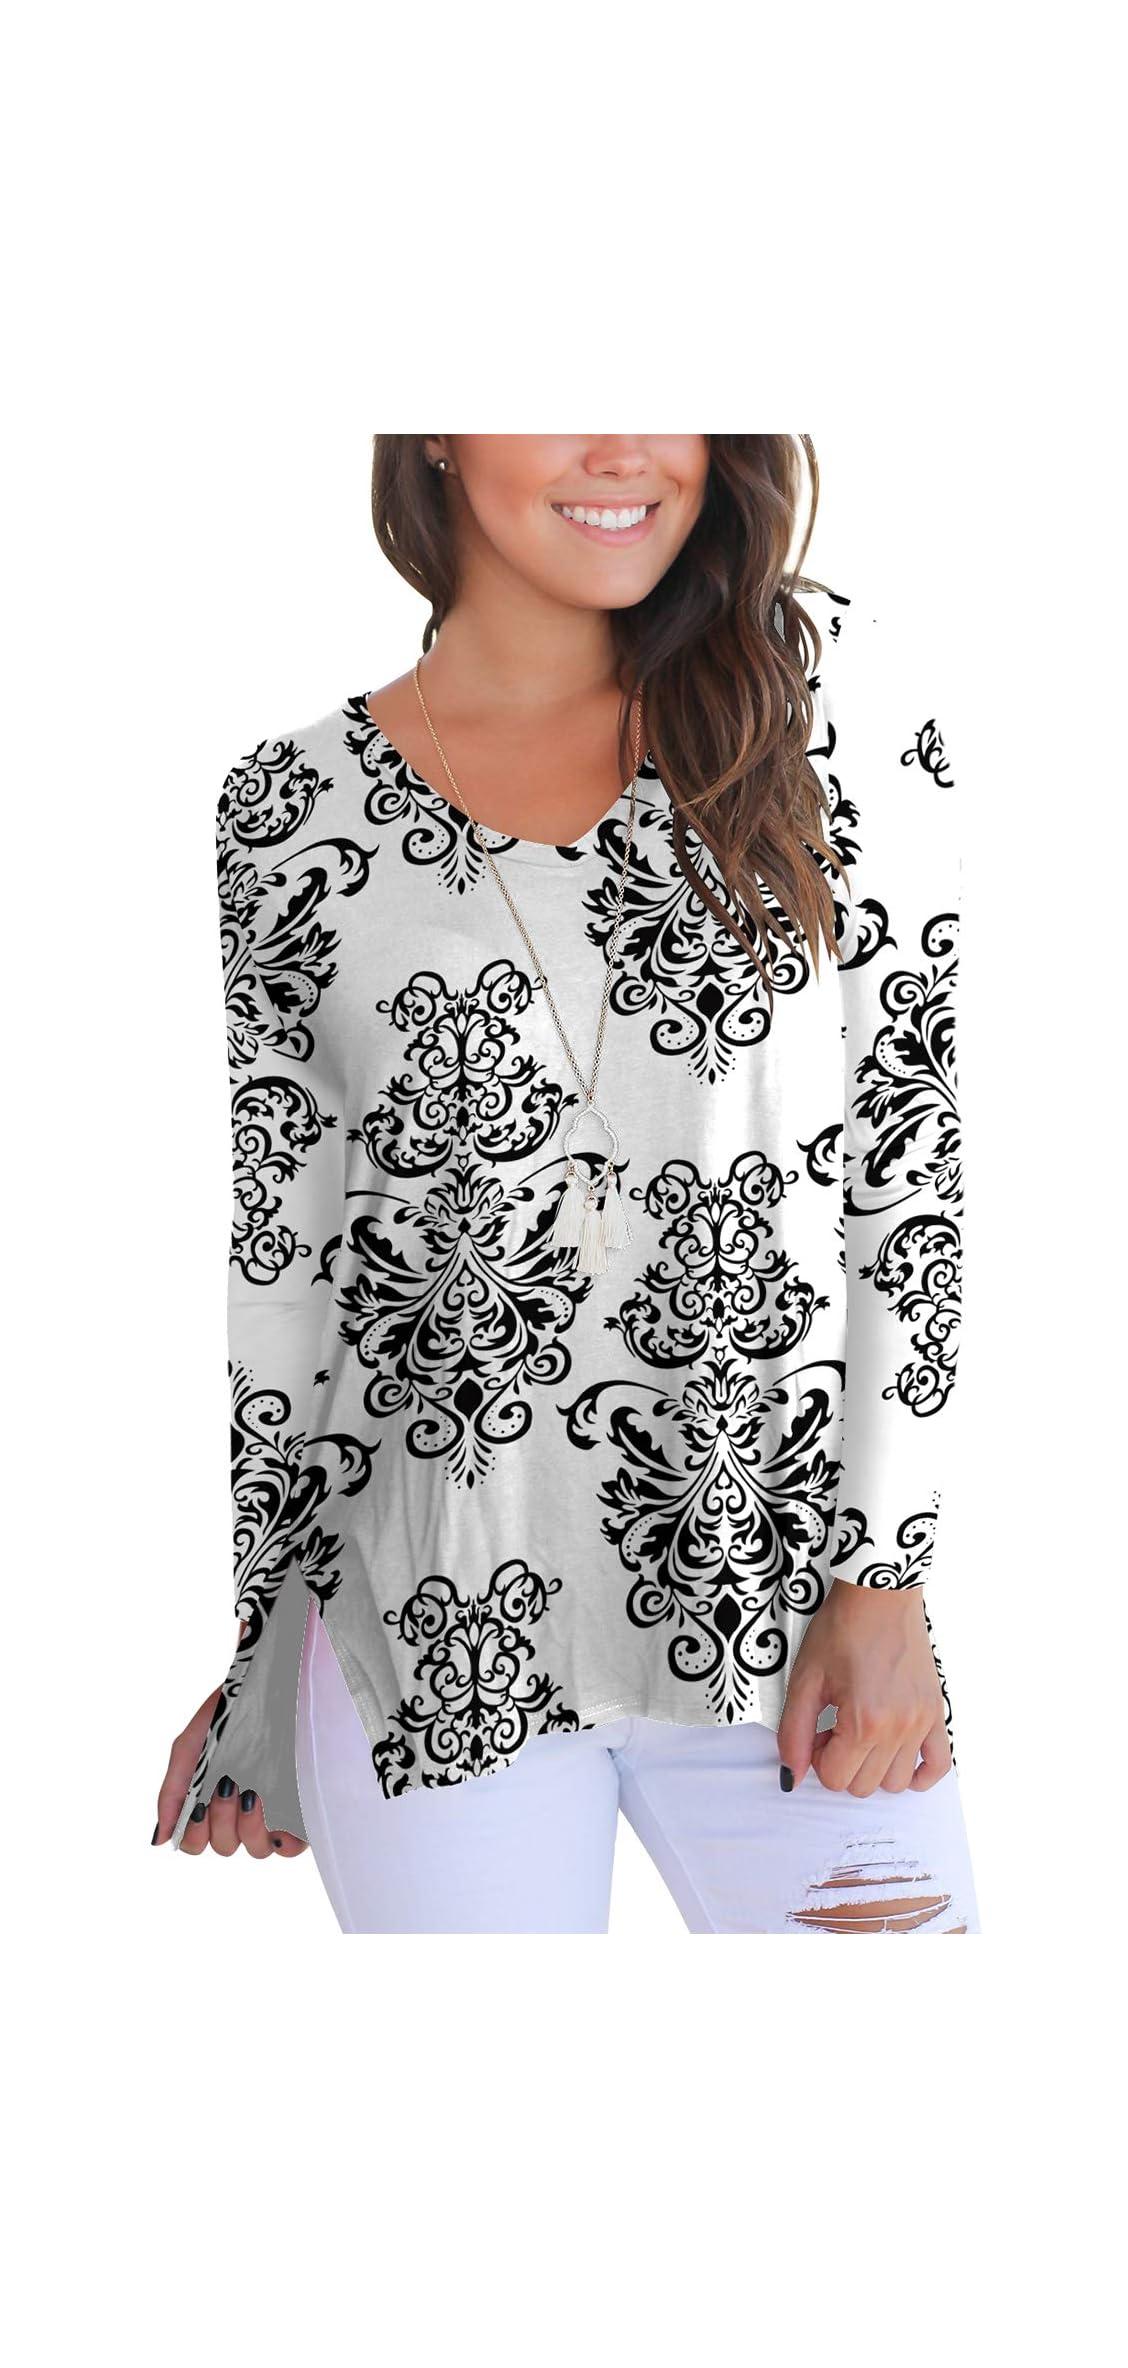 Womens Short Sleeve Floral Print V-neck T-shirt Tops